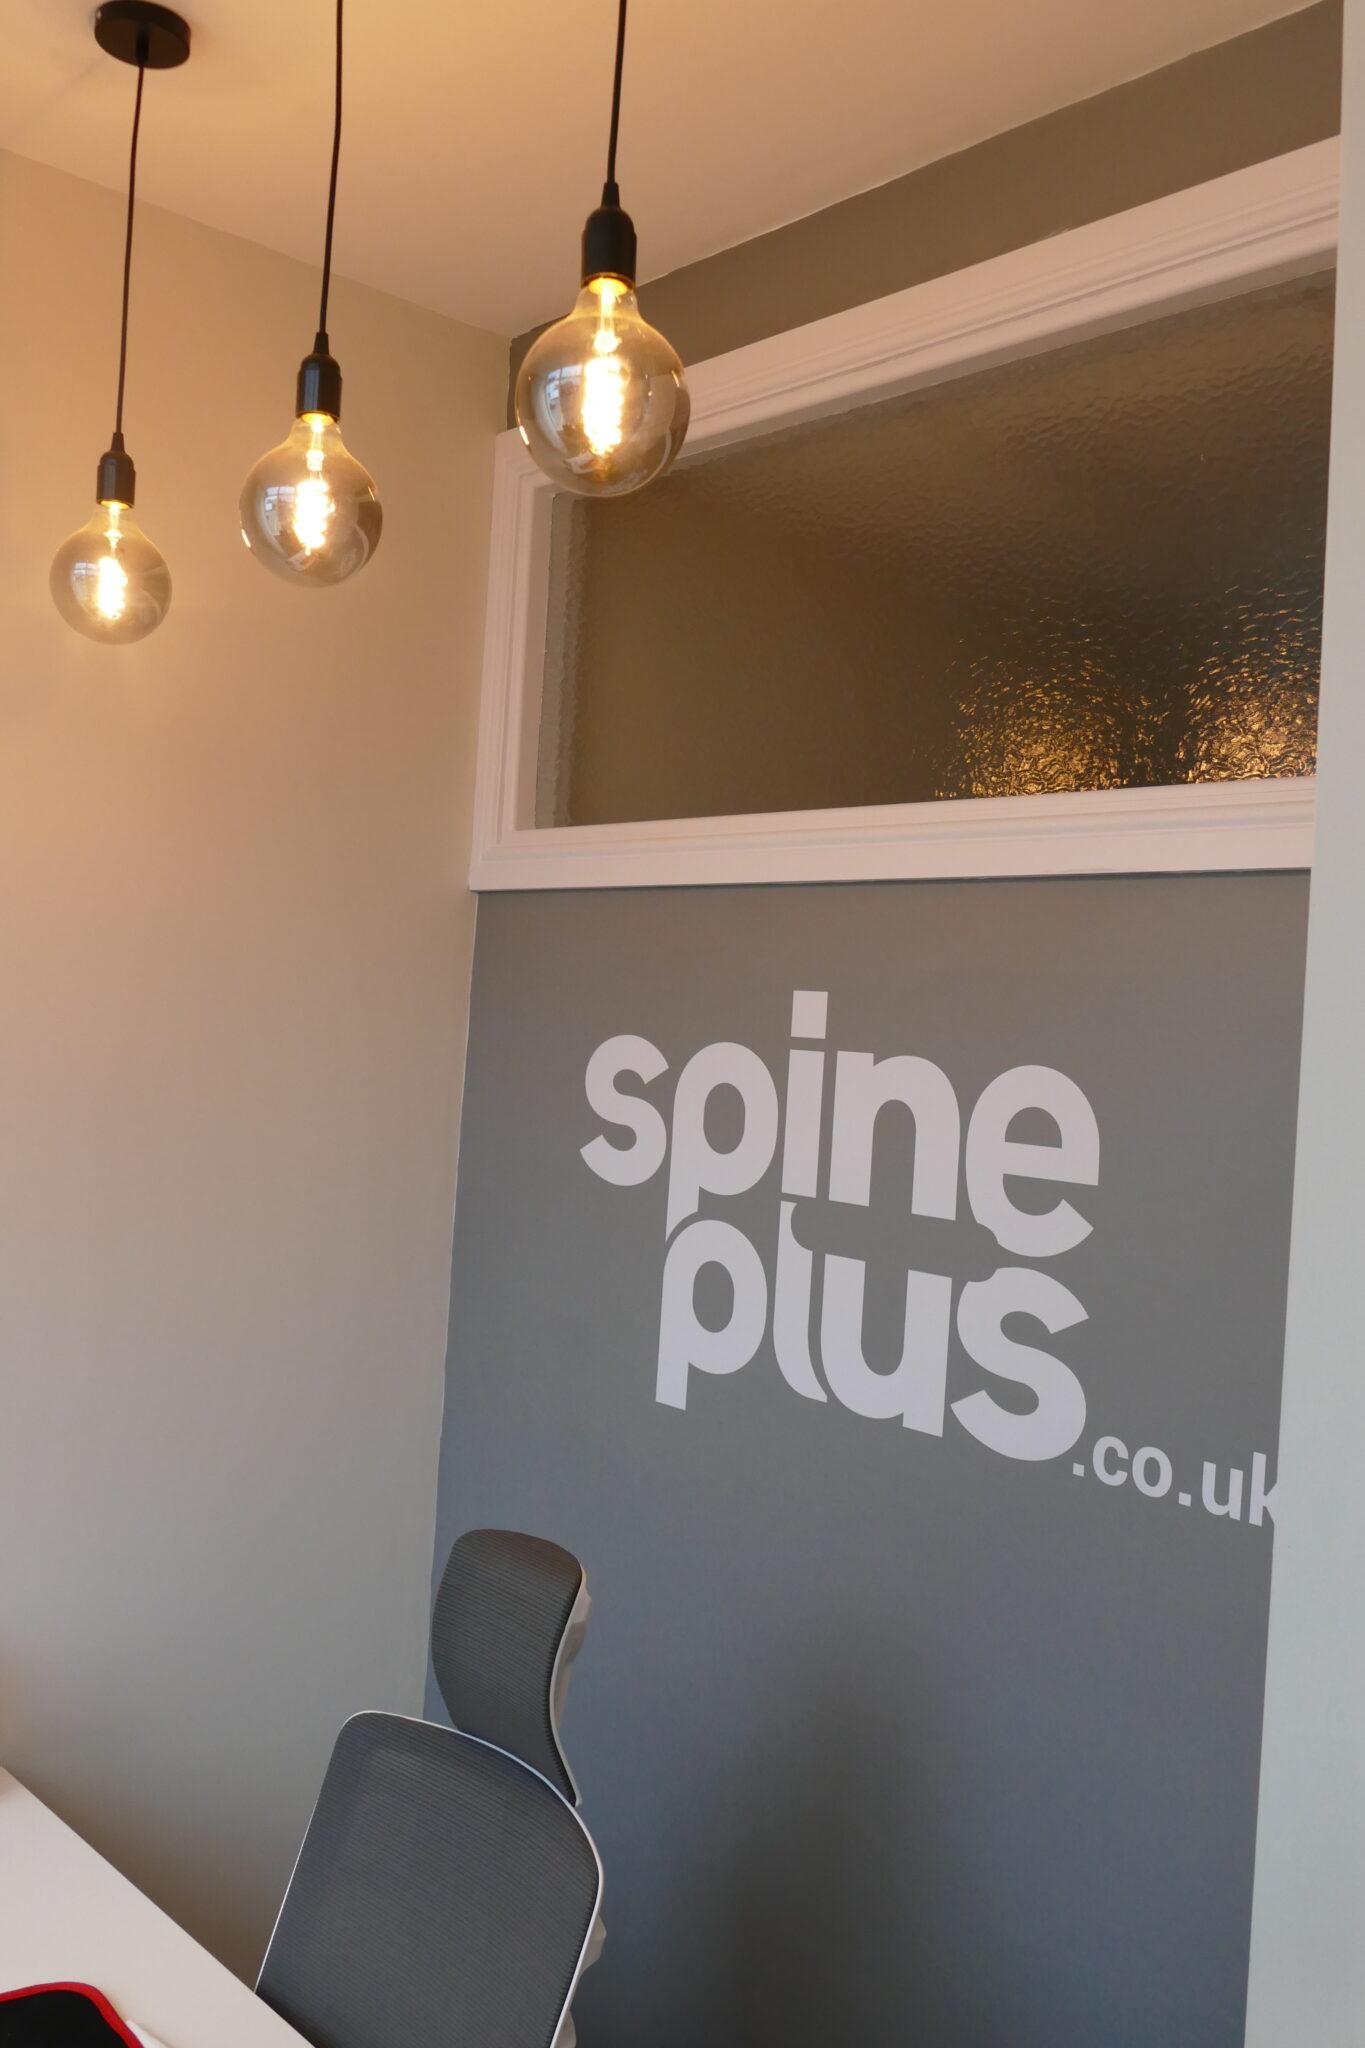 Spine Plus Hornchurch receptor